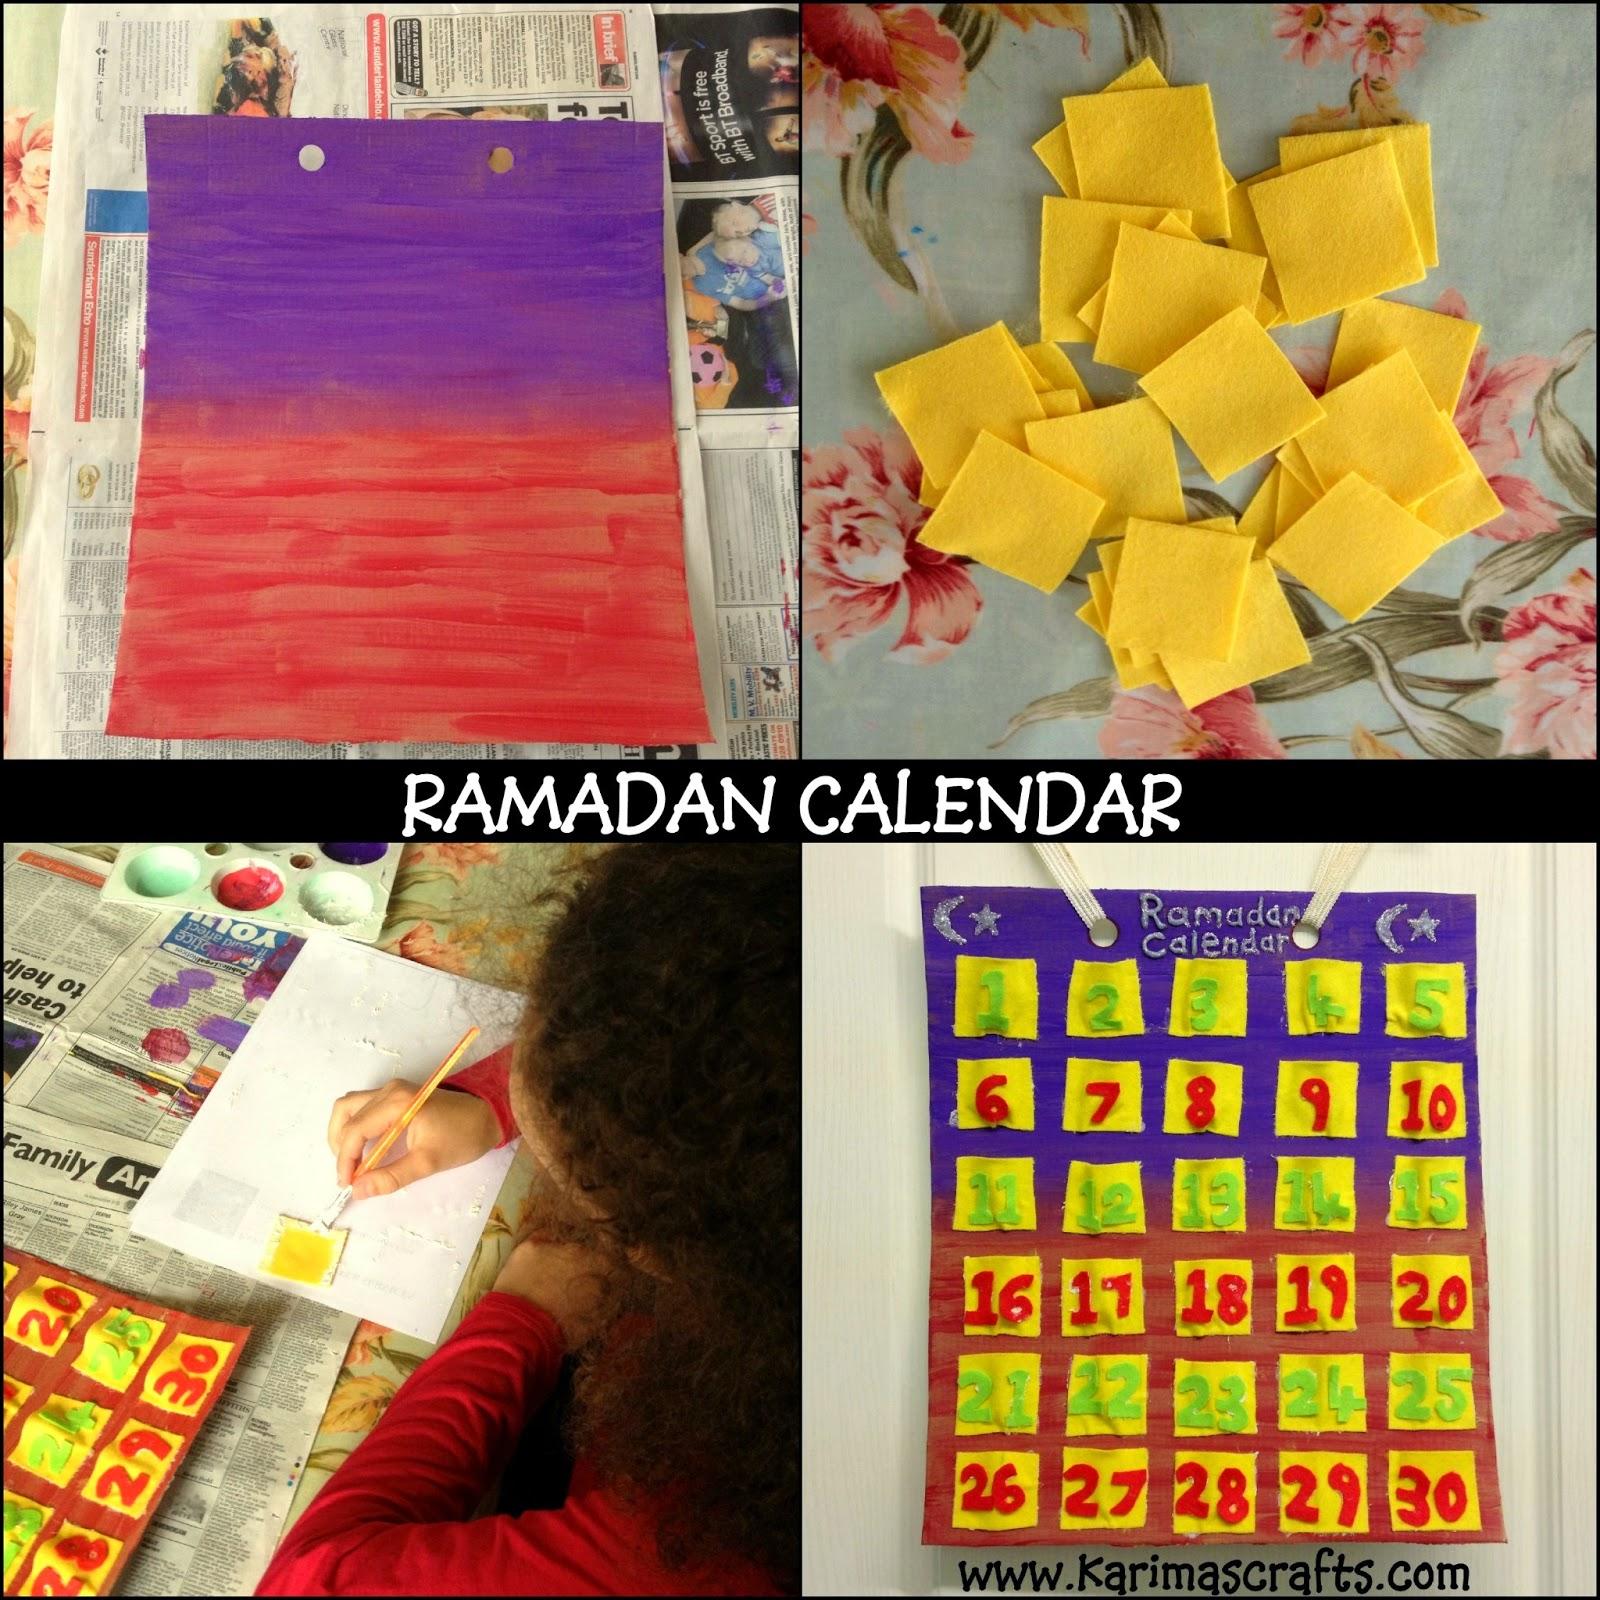 Most Inspiring 1 Day Ramadan Decor - ramadan+calendar  Trends_37206.jpg